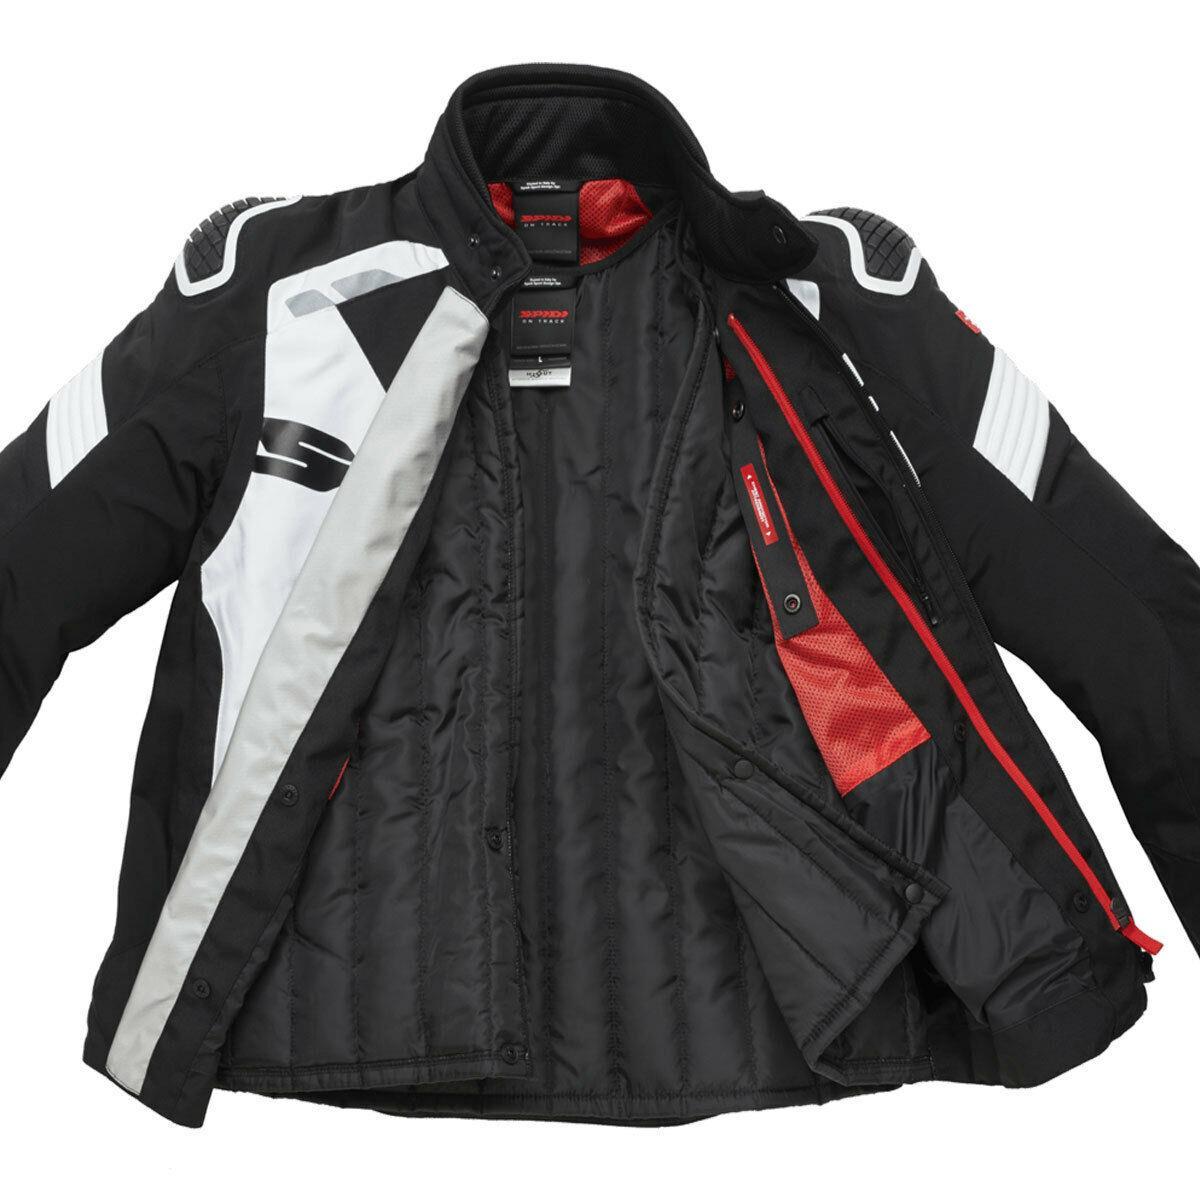 Spidi-H2Out-Warrior-Sports-Motorcycle-Motorbike-CE-Certified-Men-039-s-Jacket miniature 8